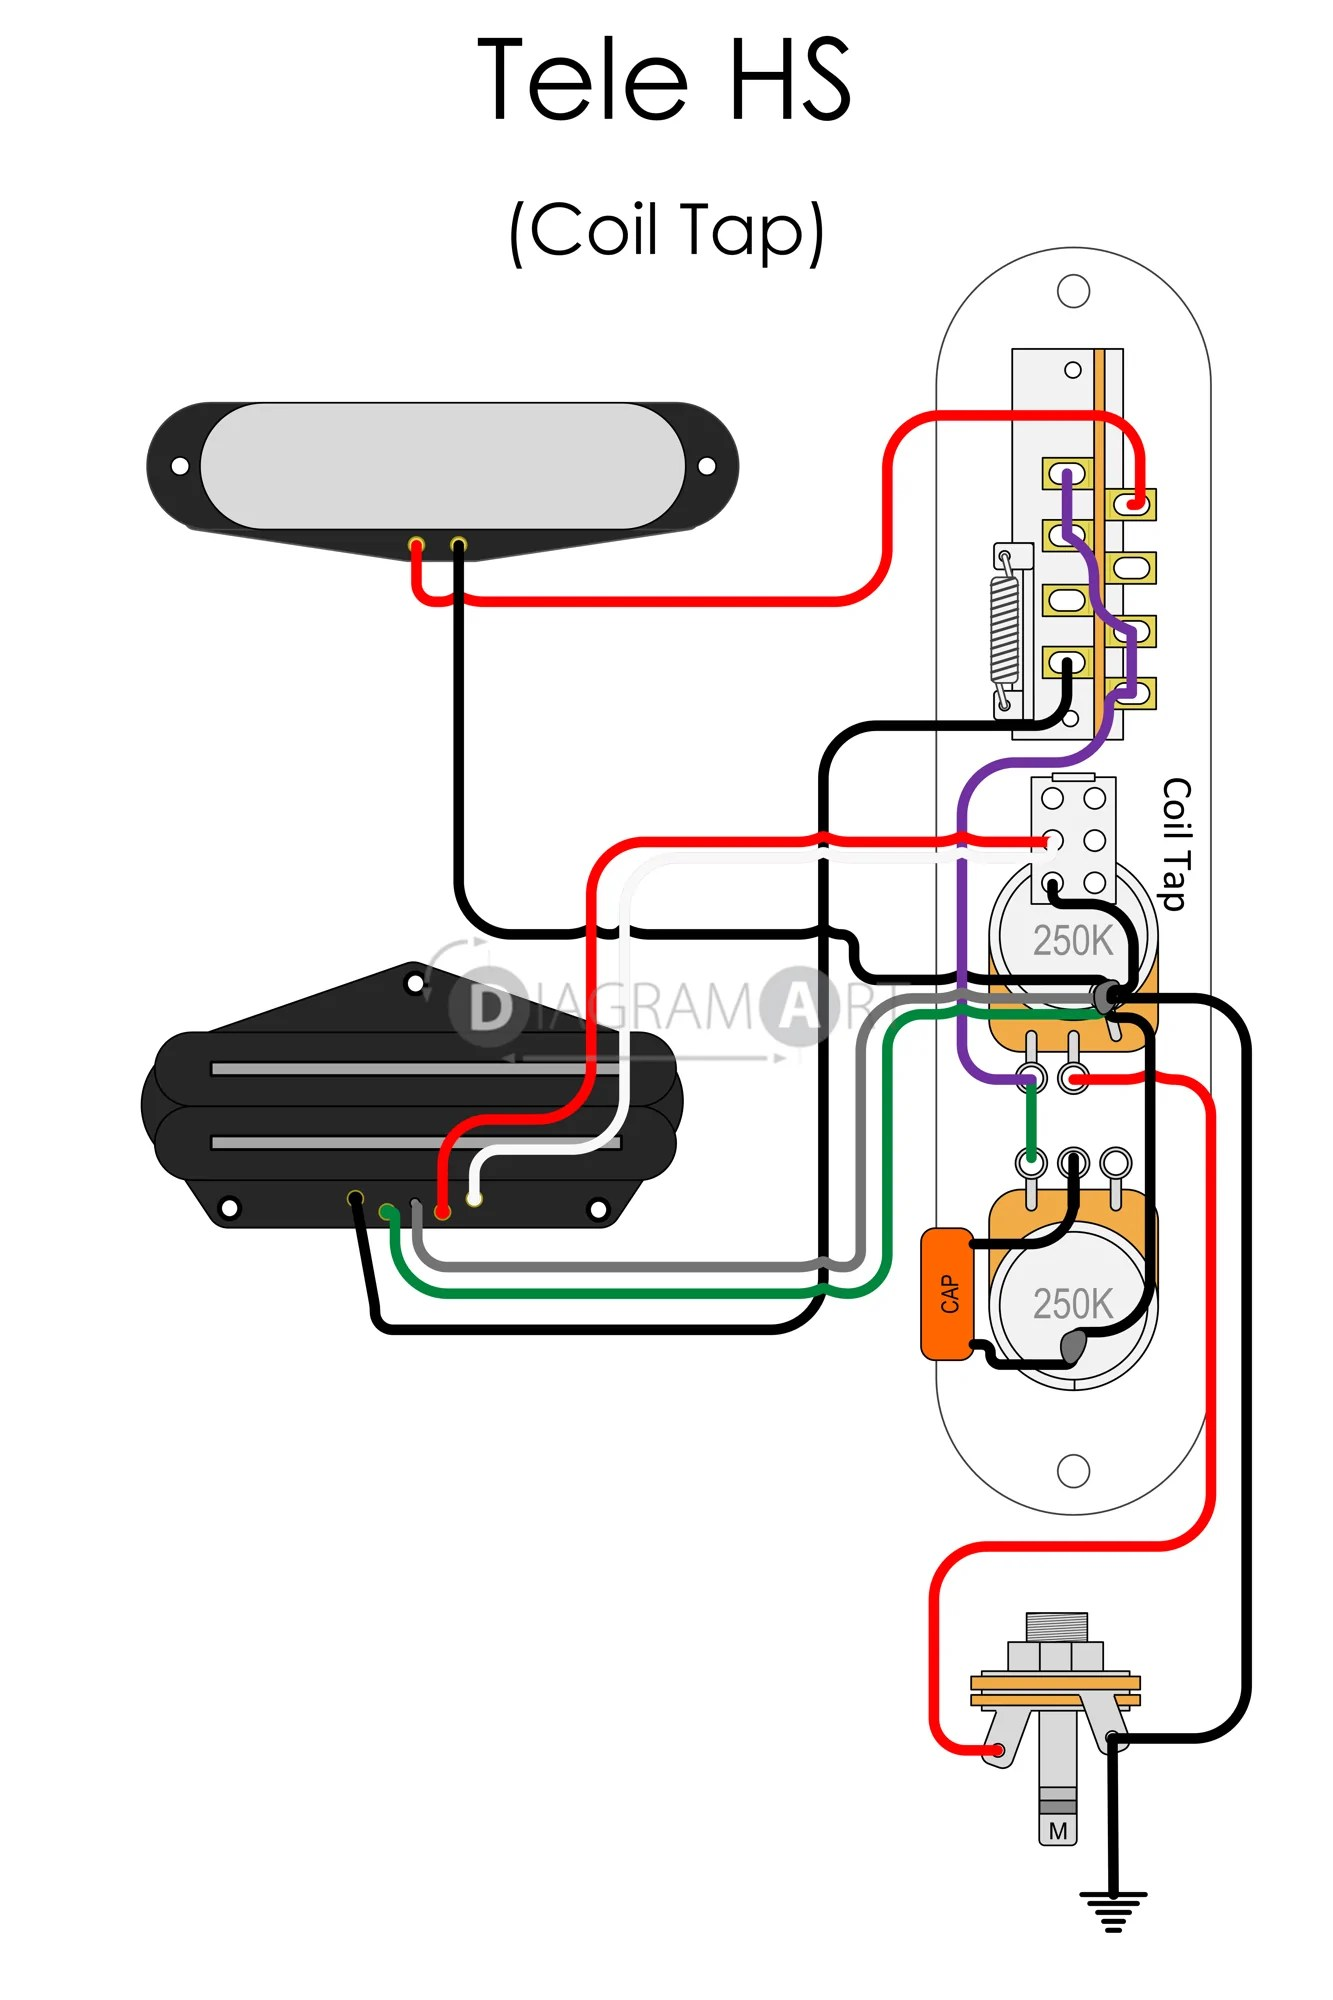 electric guitar wiring tele hs coil tap electric circuit fender duo sonic hs wiring diagram hs wiring diagram [ 1333 x 2000 Pixel ]